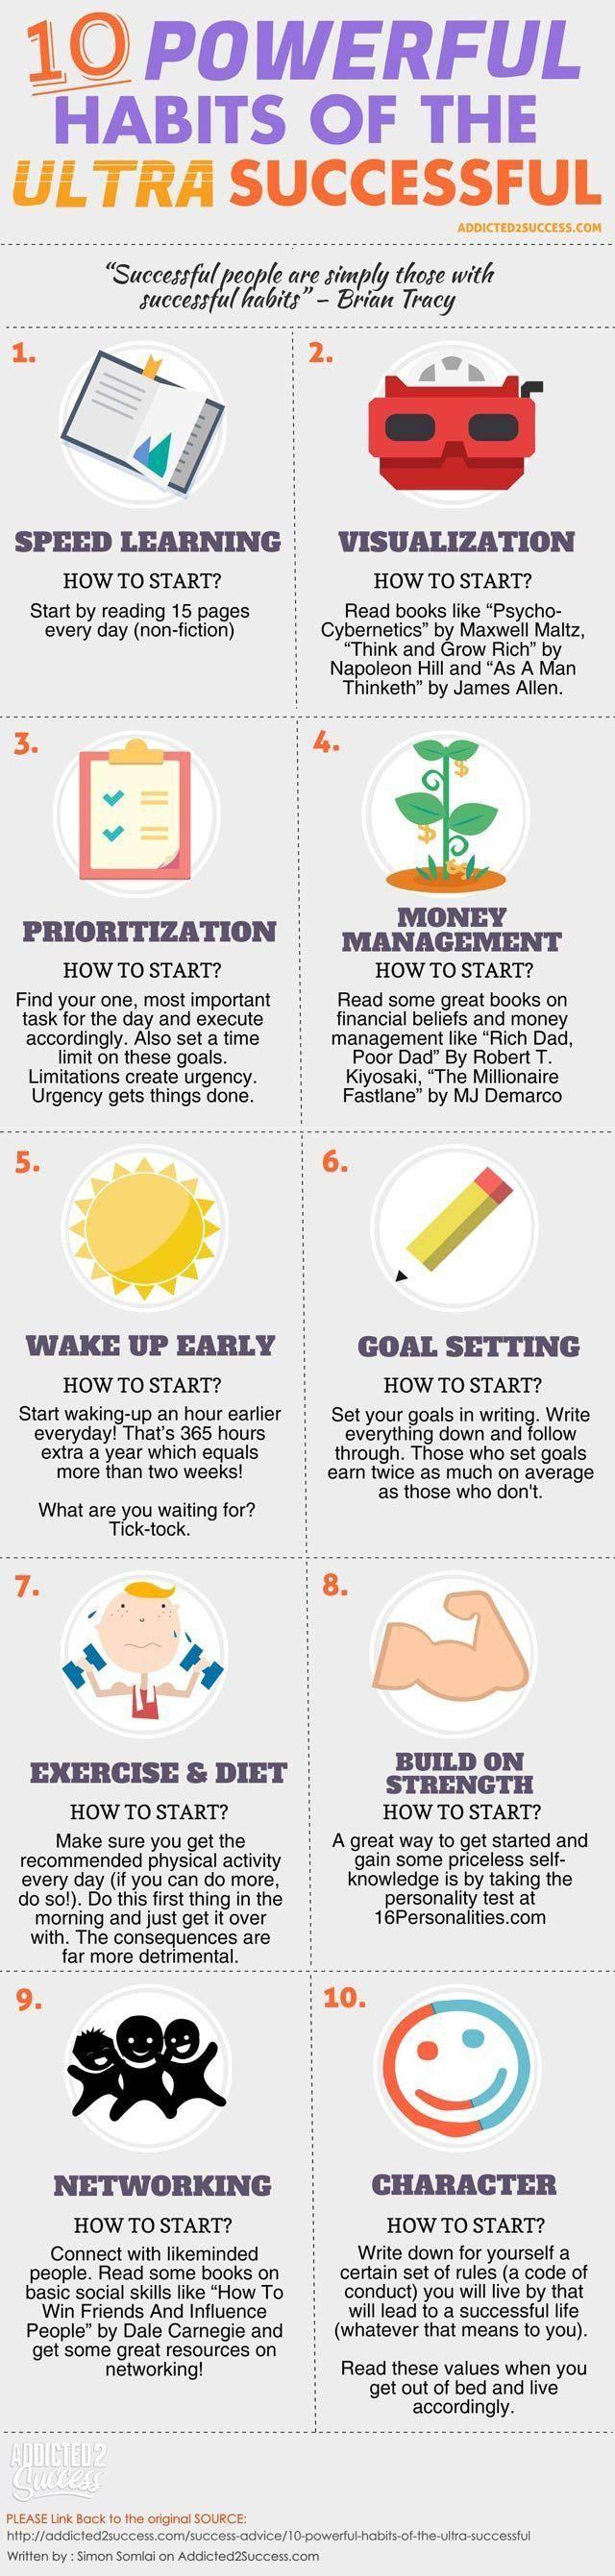 Pinterest: BrownHoneyLdn // 10 Powerful Habits of the Ultra Successful